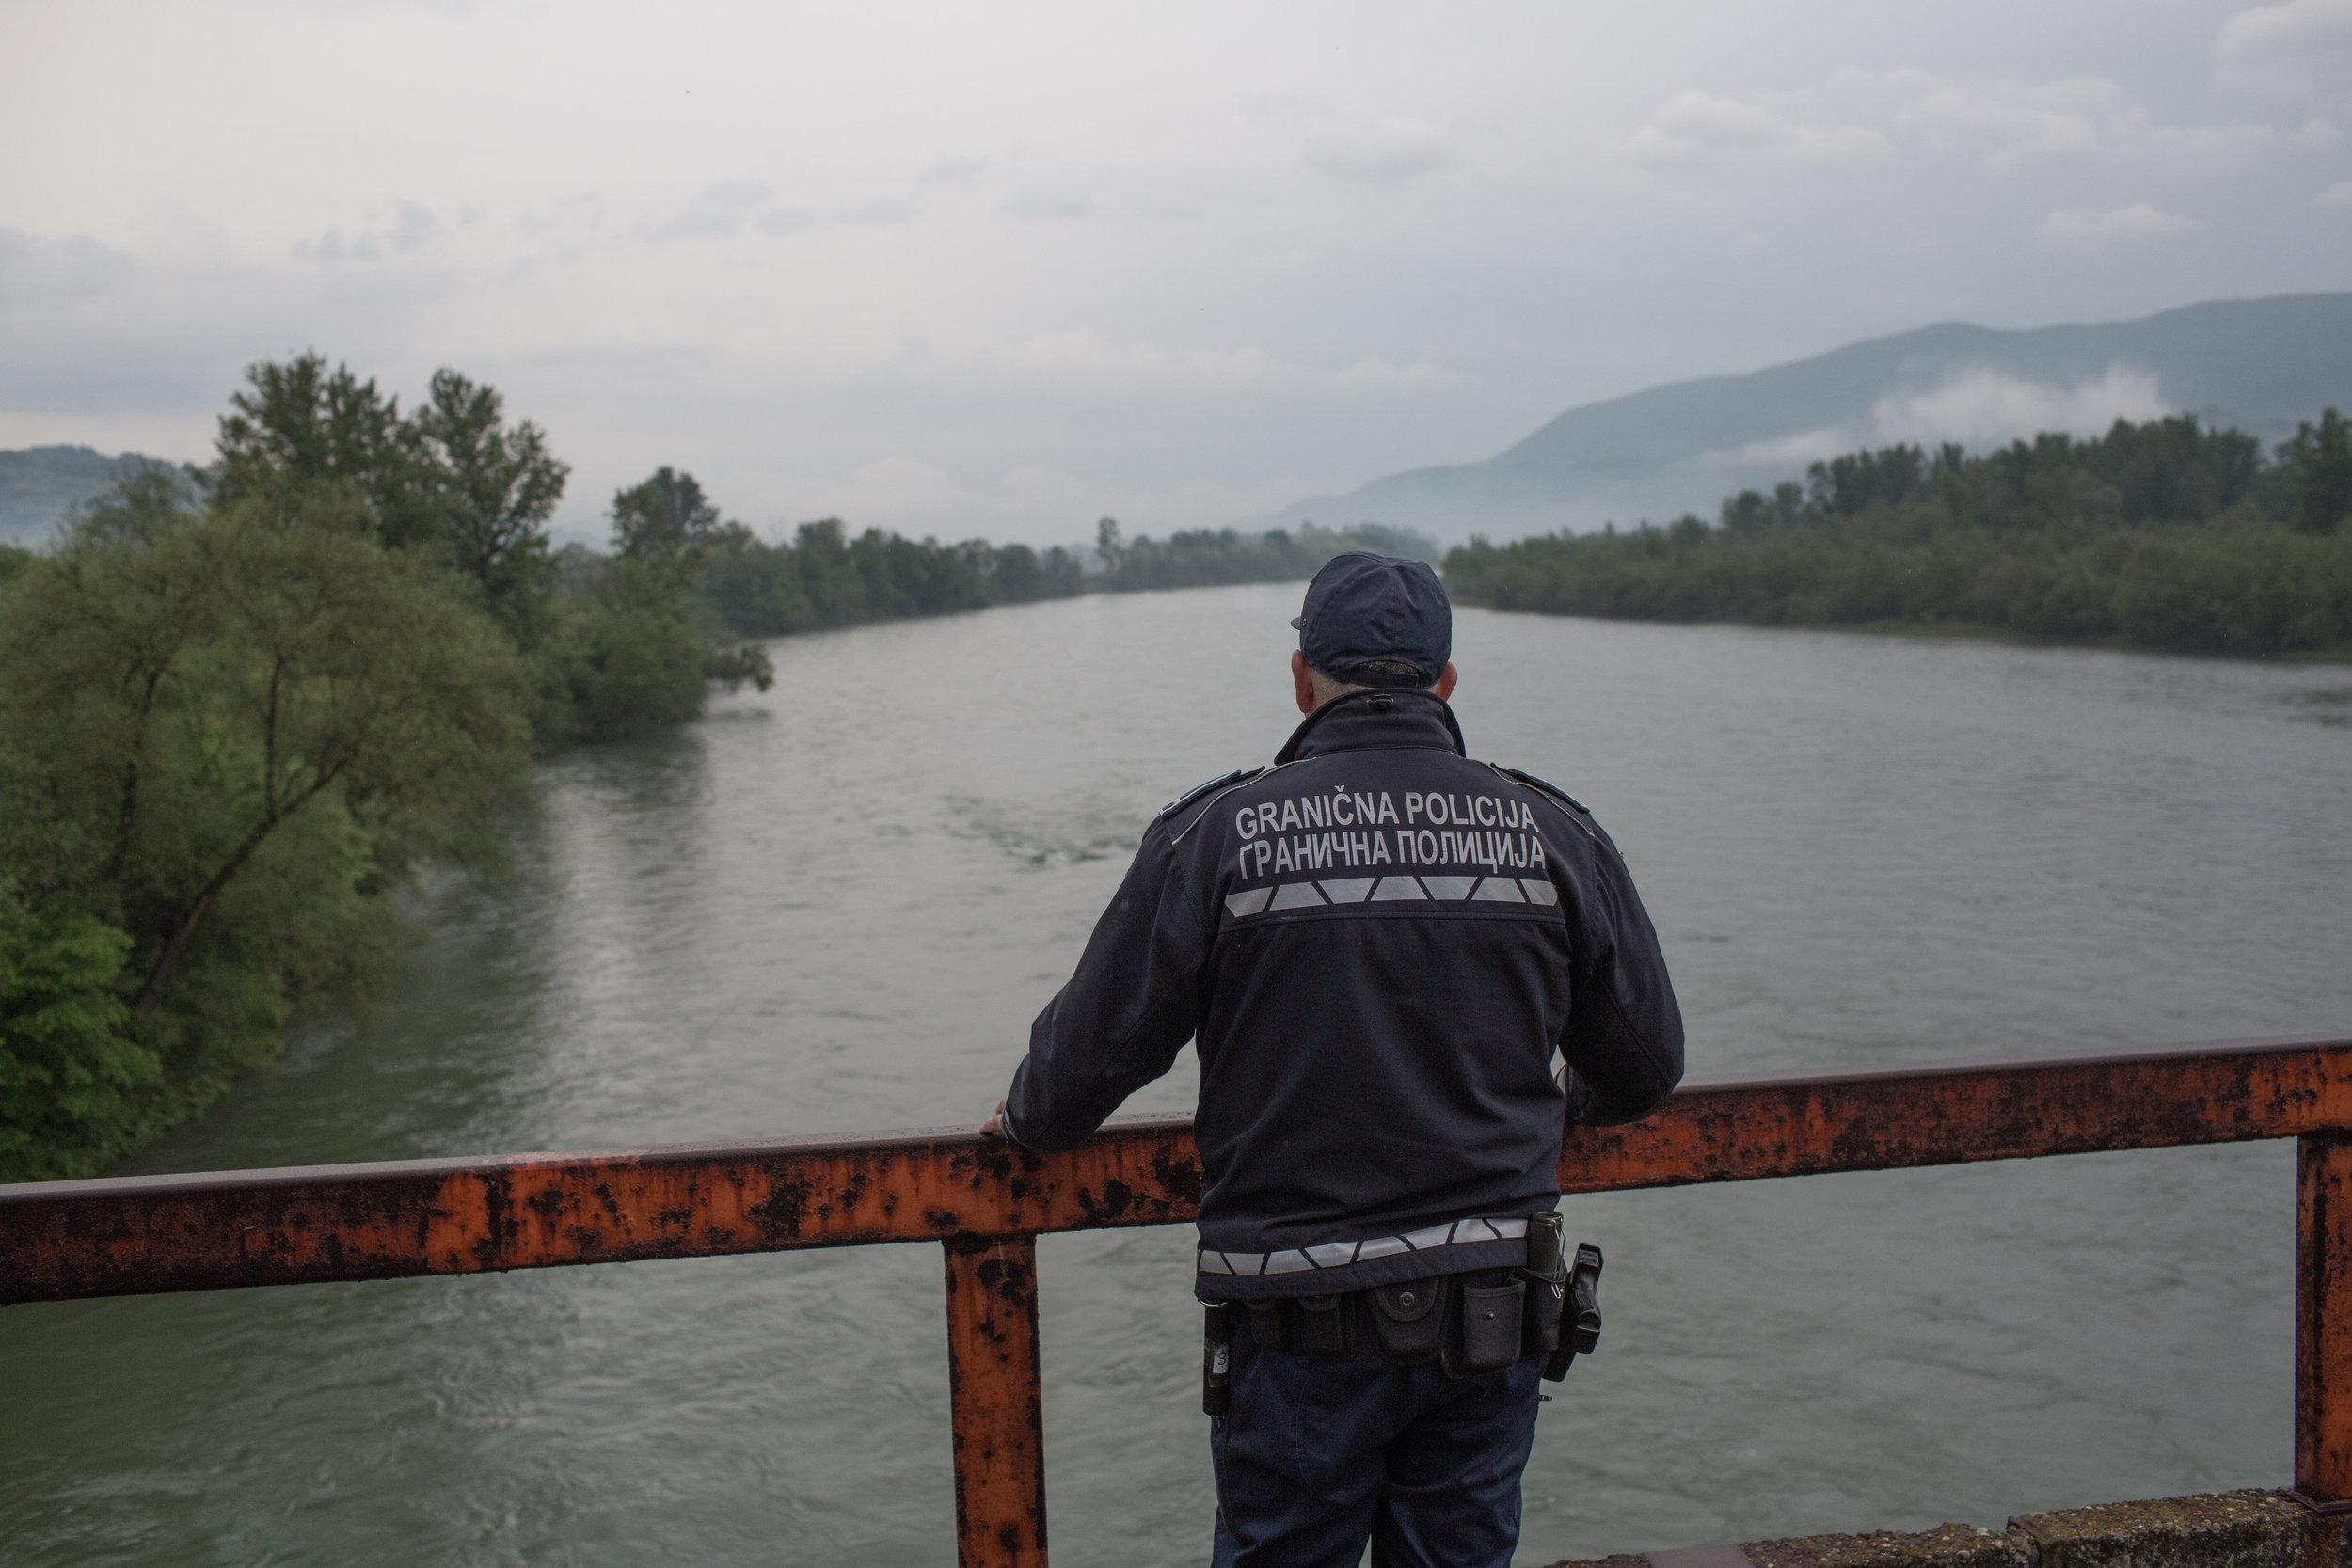 Railway bridge across the Drina River near Karakaj on the border between BiH and Serbia.